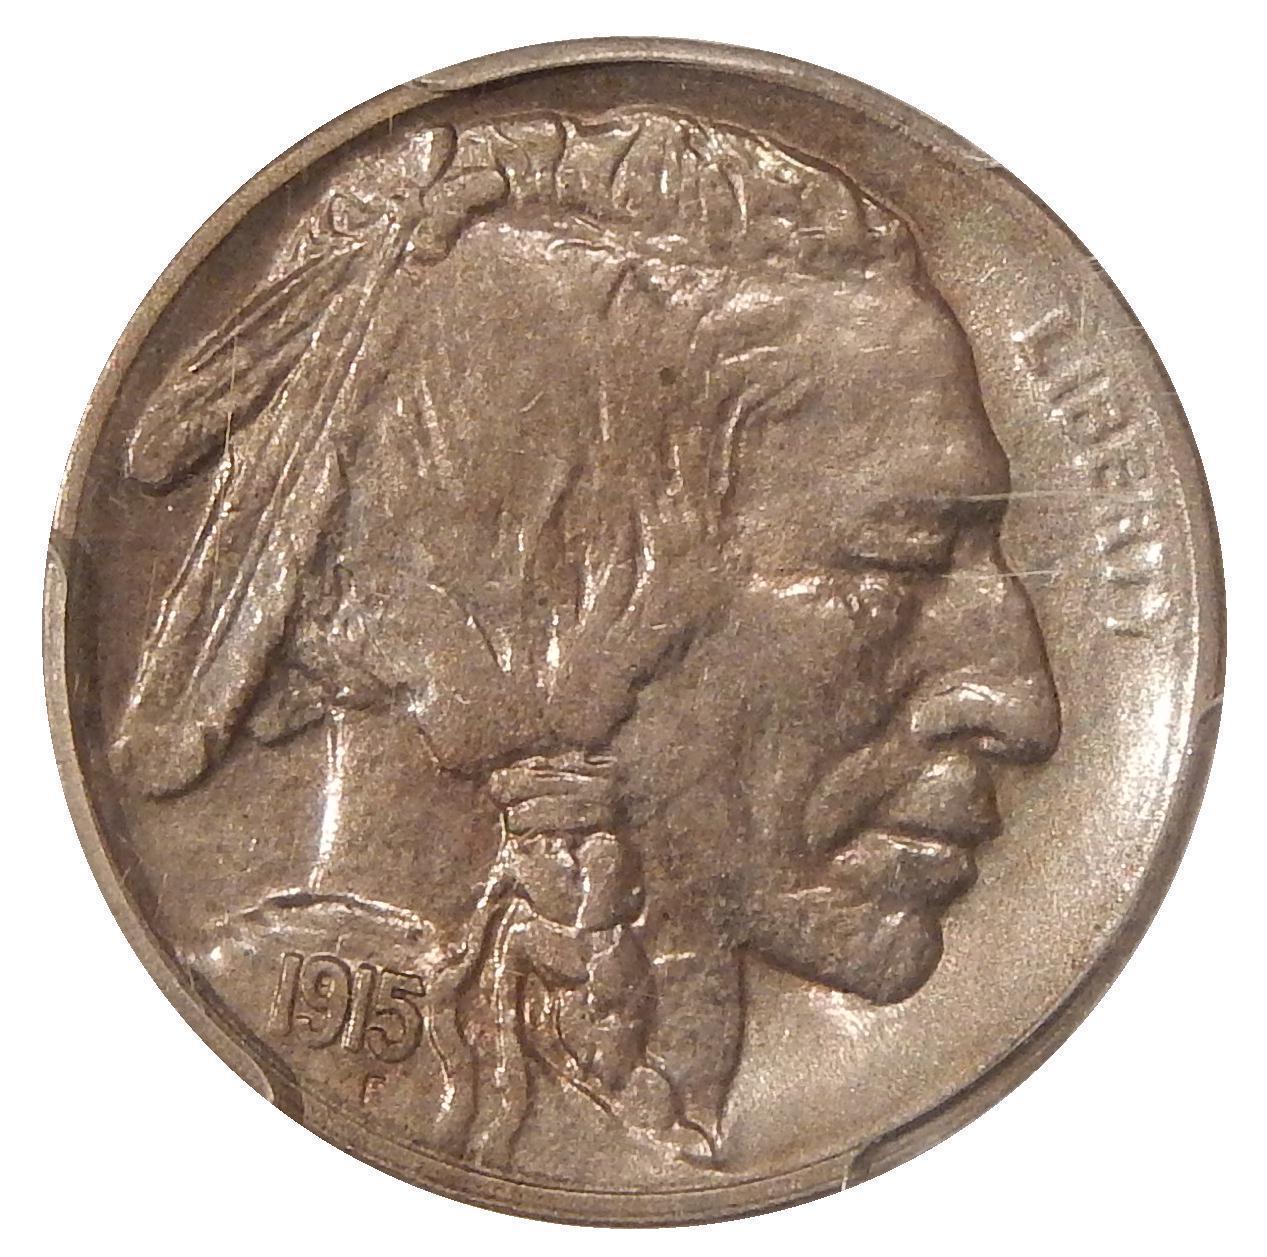 1915-S Buffalo Nickel Graded PCGS AU58